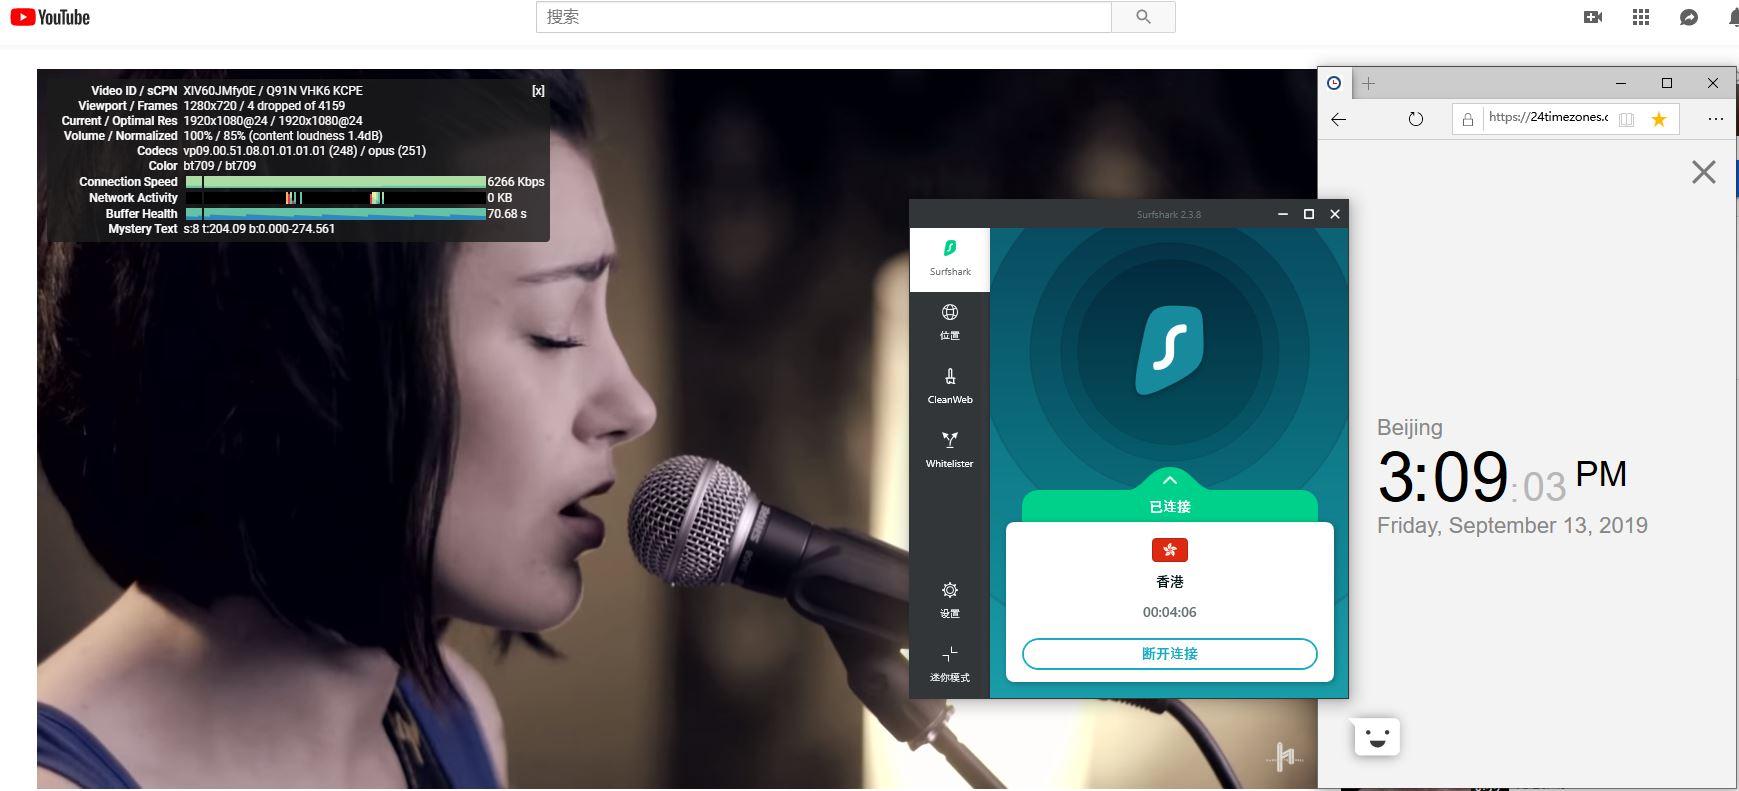 windows Surfshark VPN 香港服务器 中国VPN翻墙软件 科学上网 YouTube速度测试-20190913